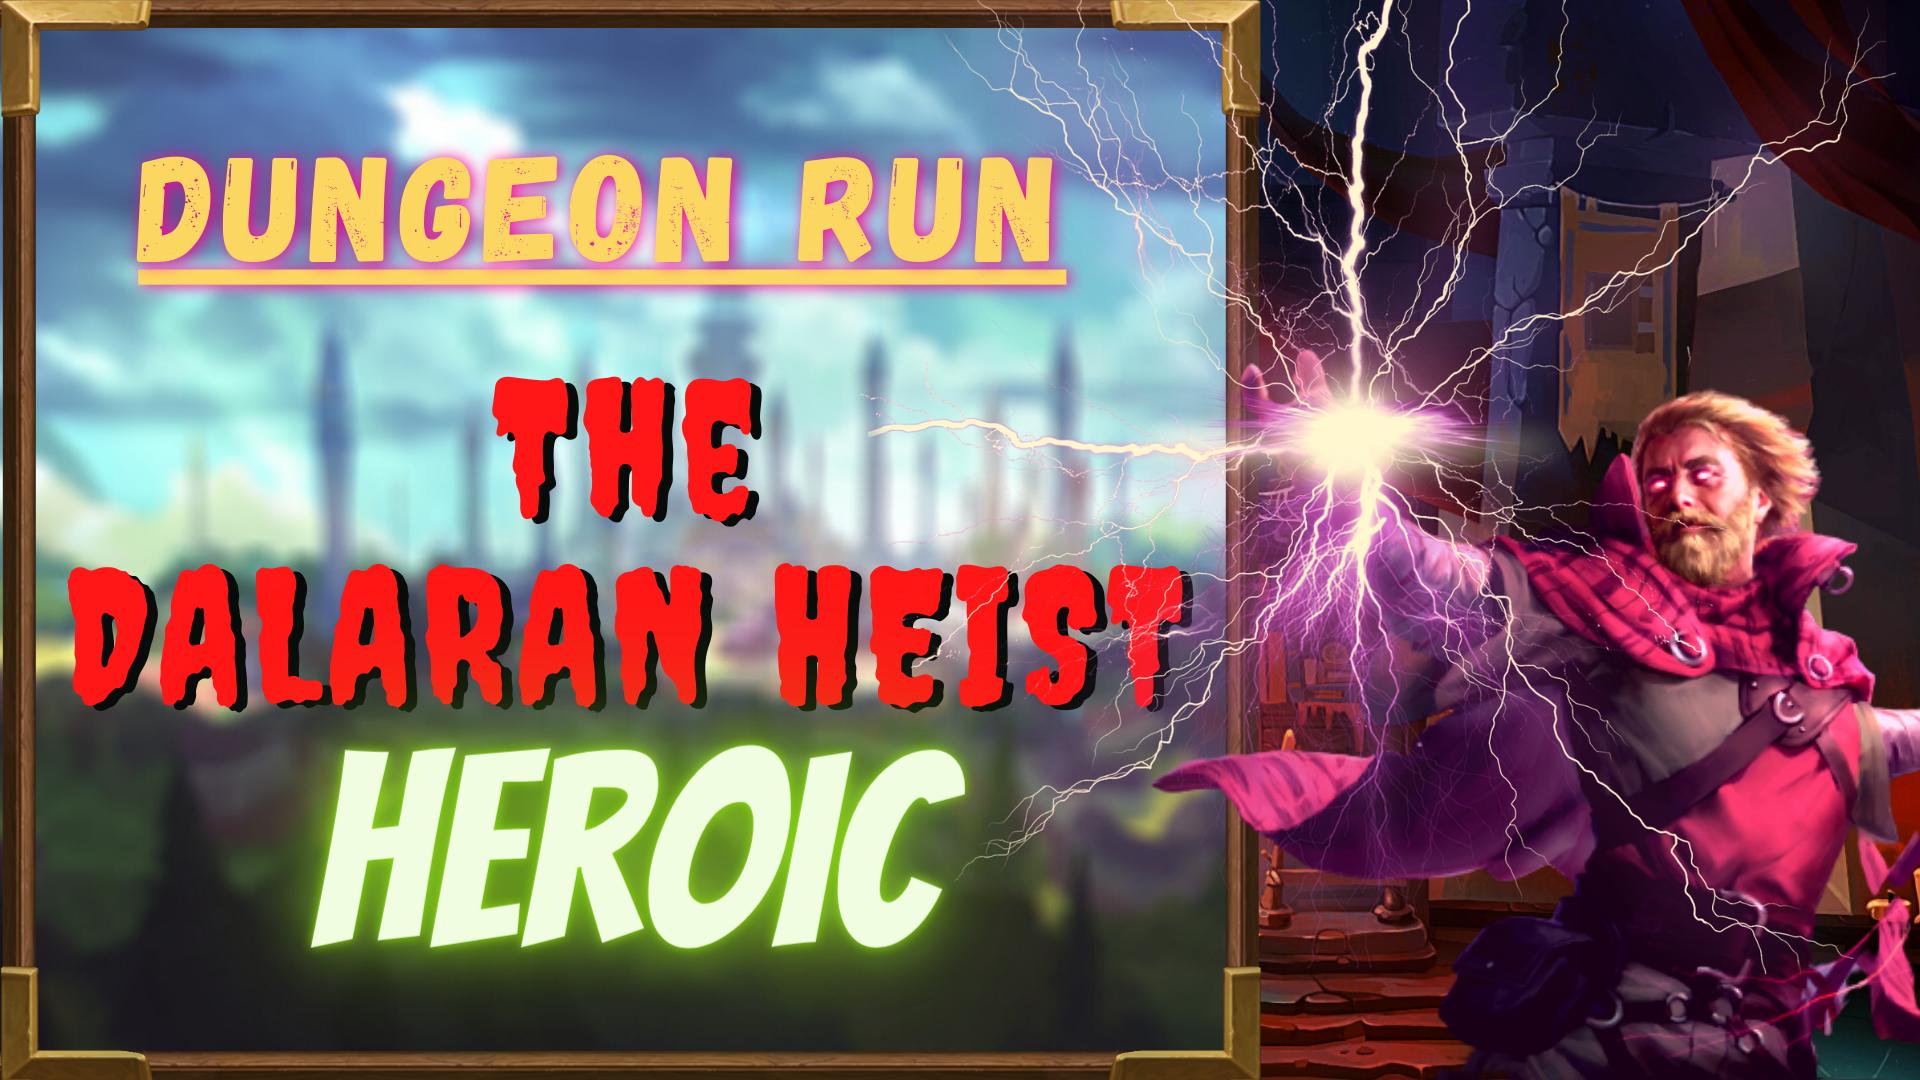 DUNGEON RUN: THE DALARAN HEIST - HEROIC GBD - e2p.com